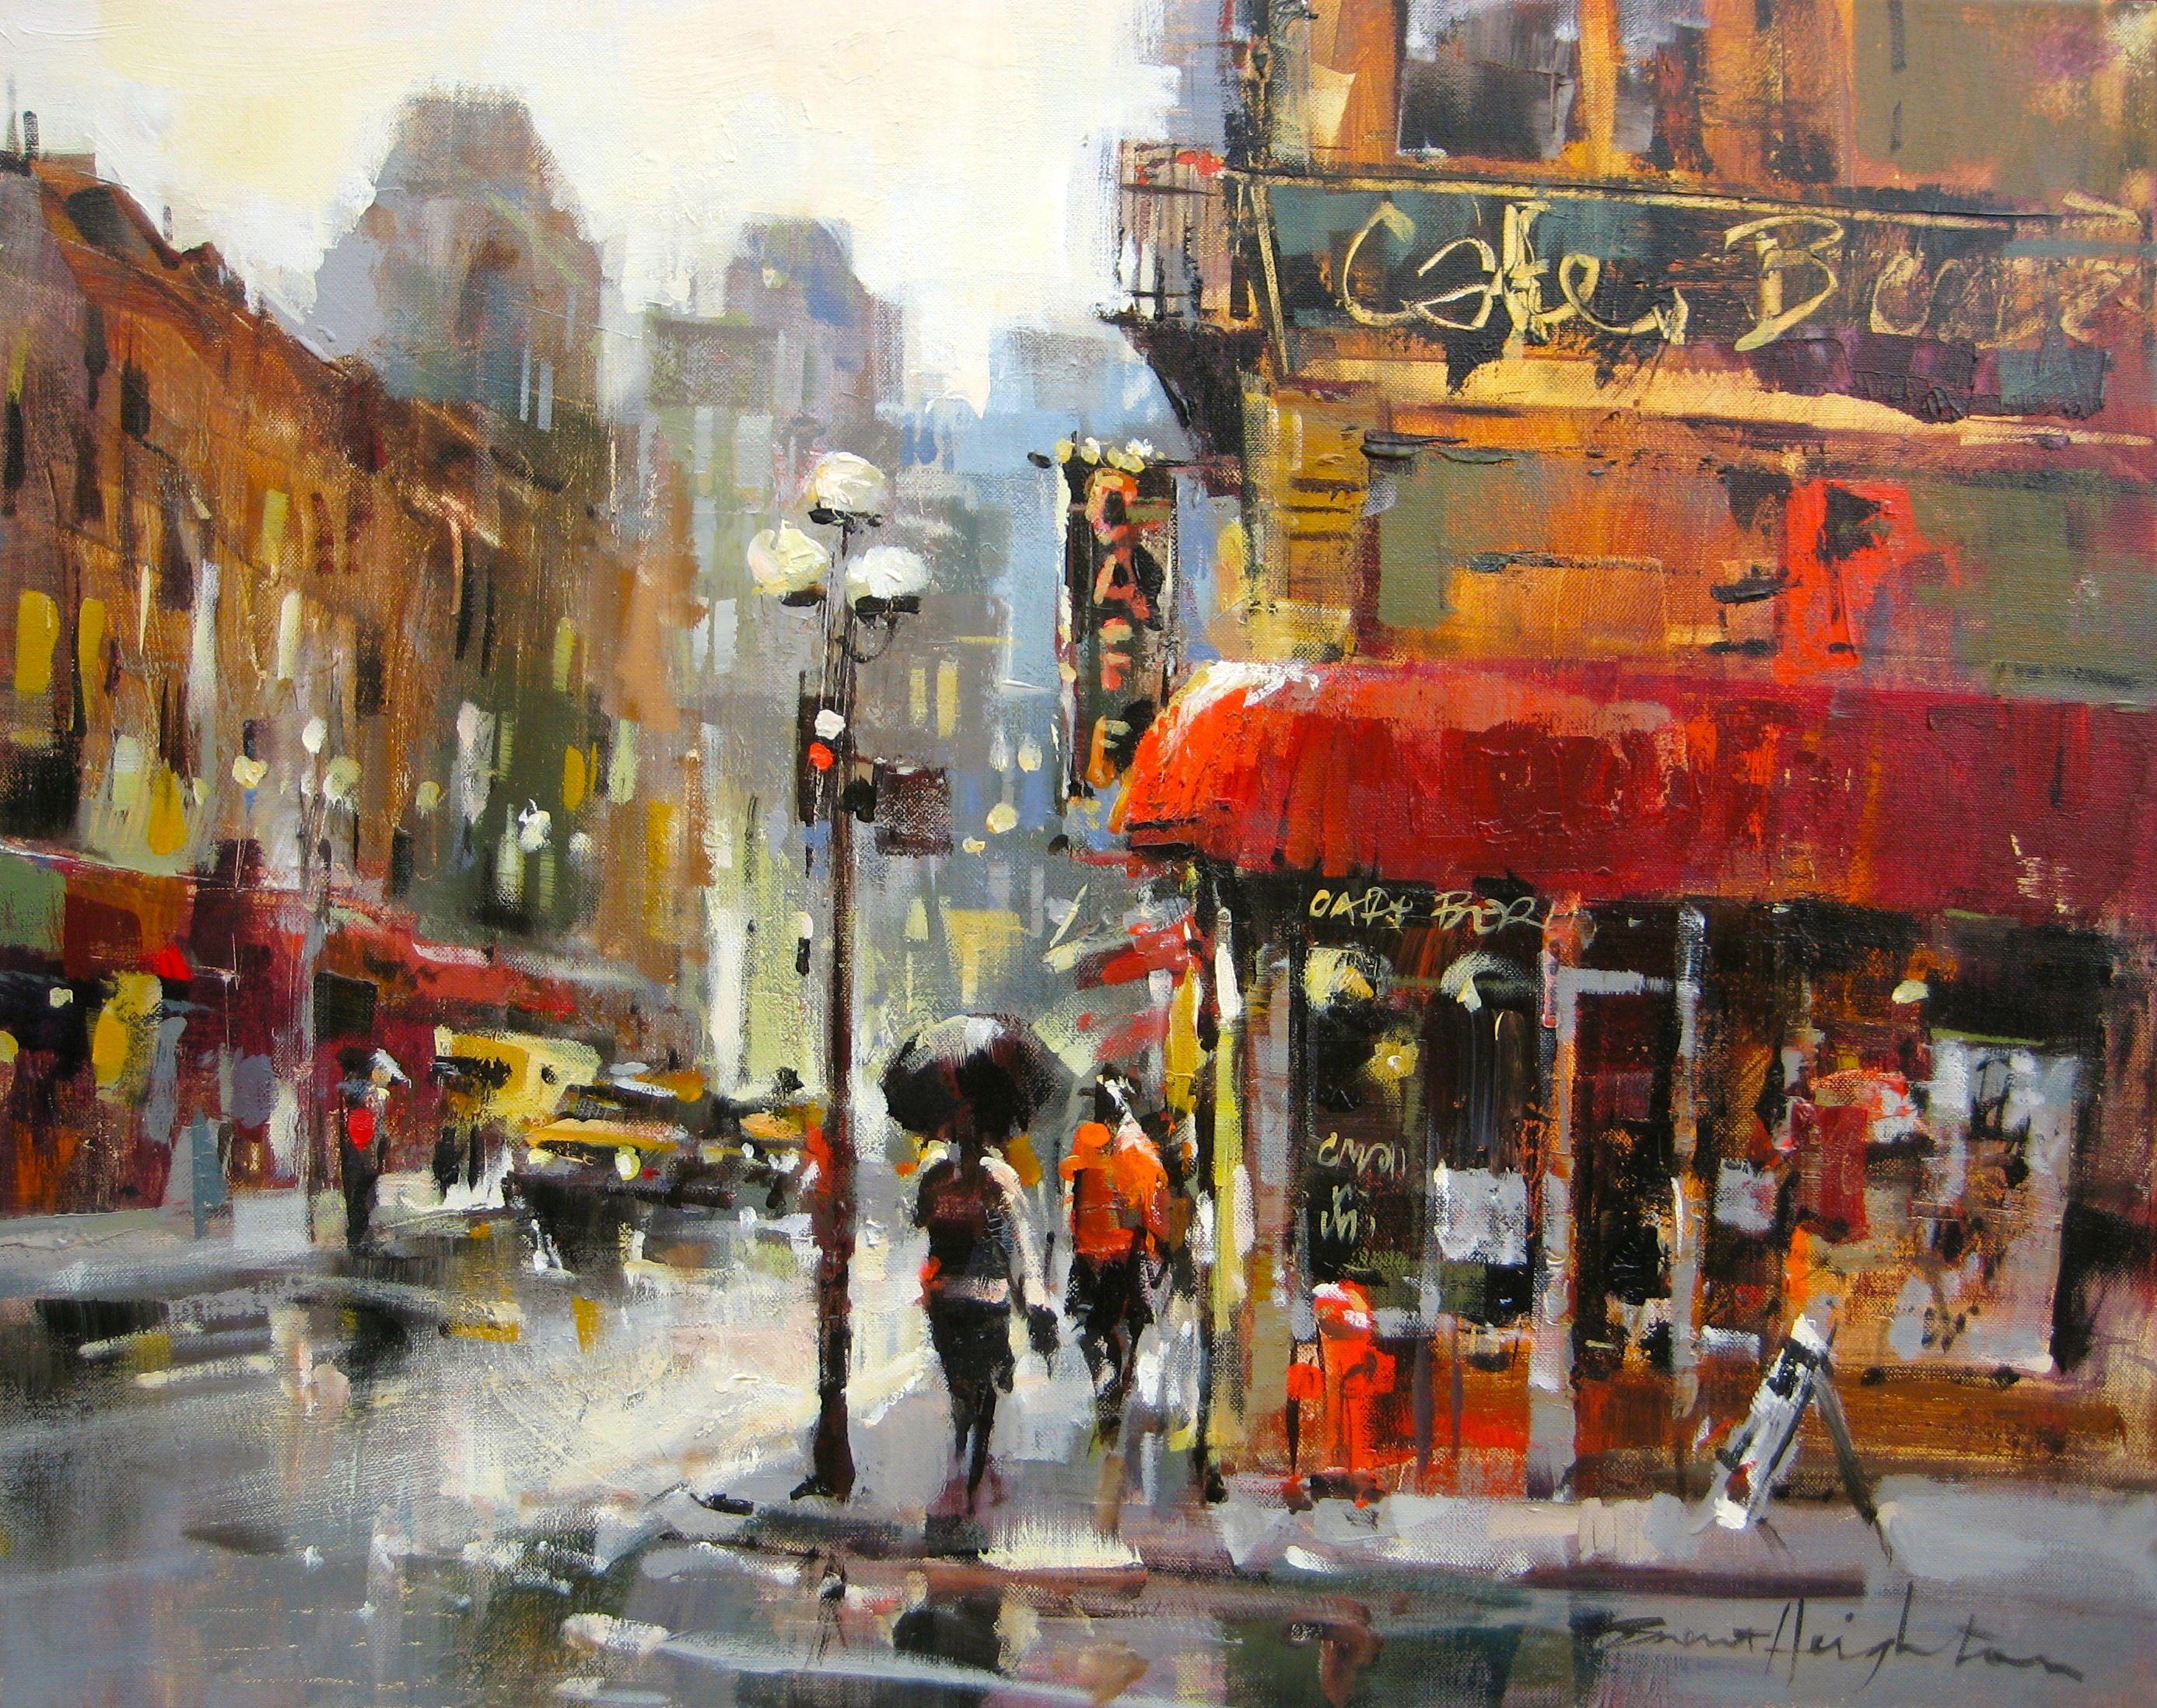 Brent Heighton Rain Painting Brent Heighton Painting